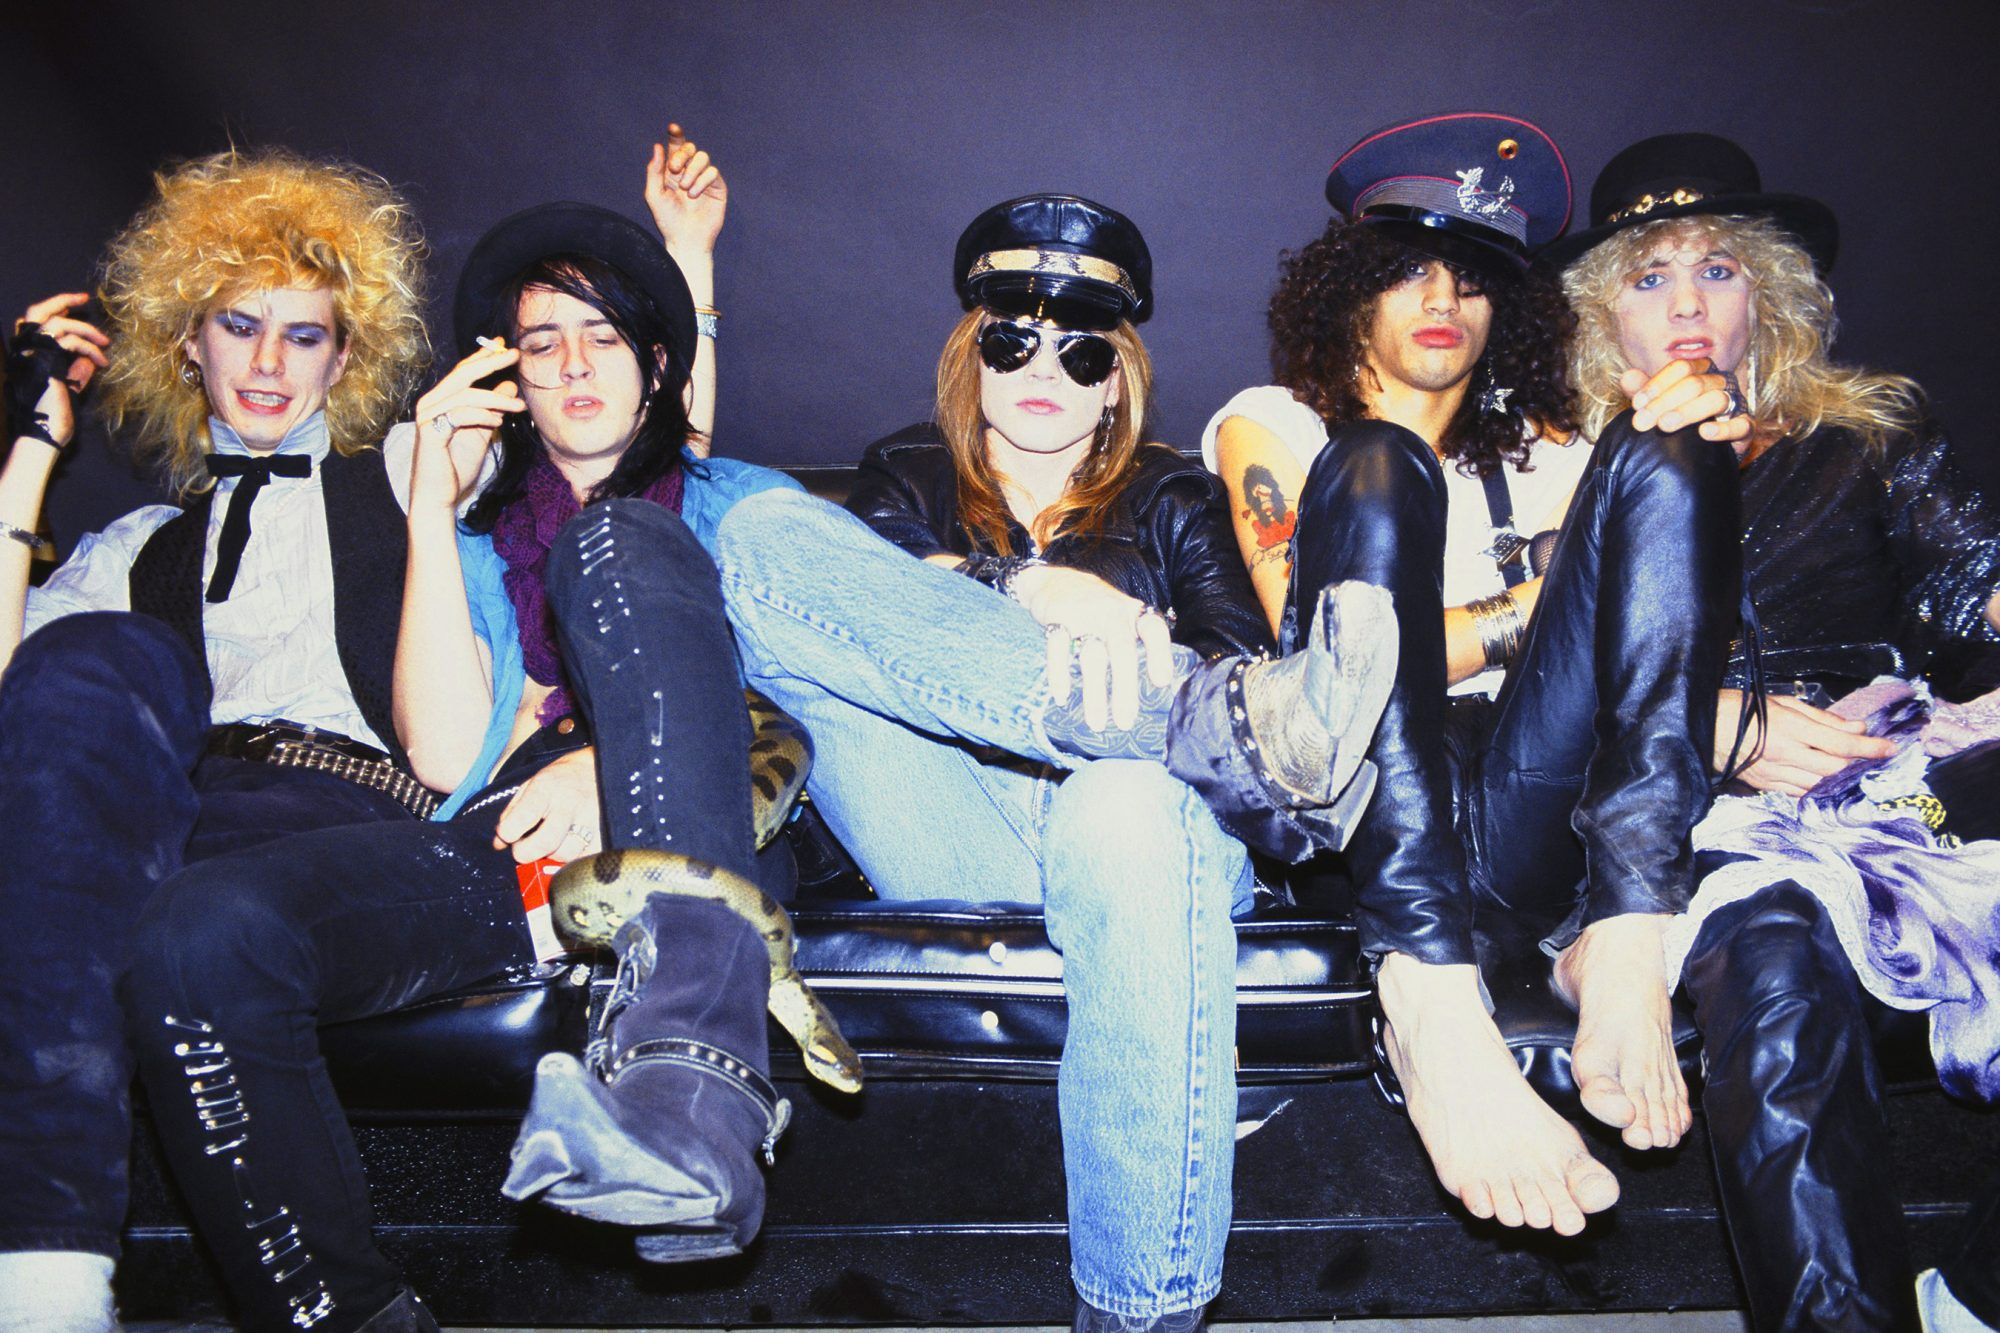 Guns n' Roses Group Portrait